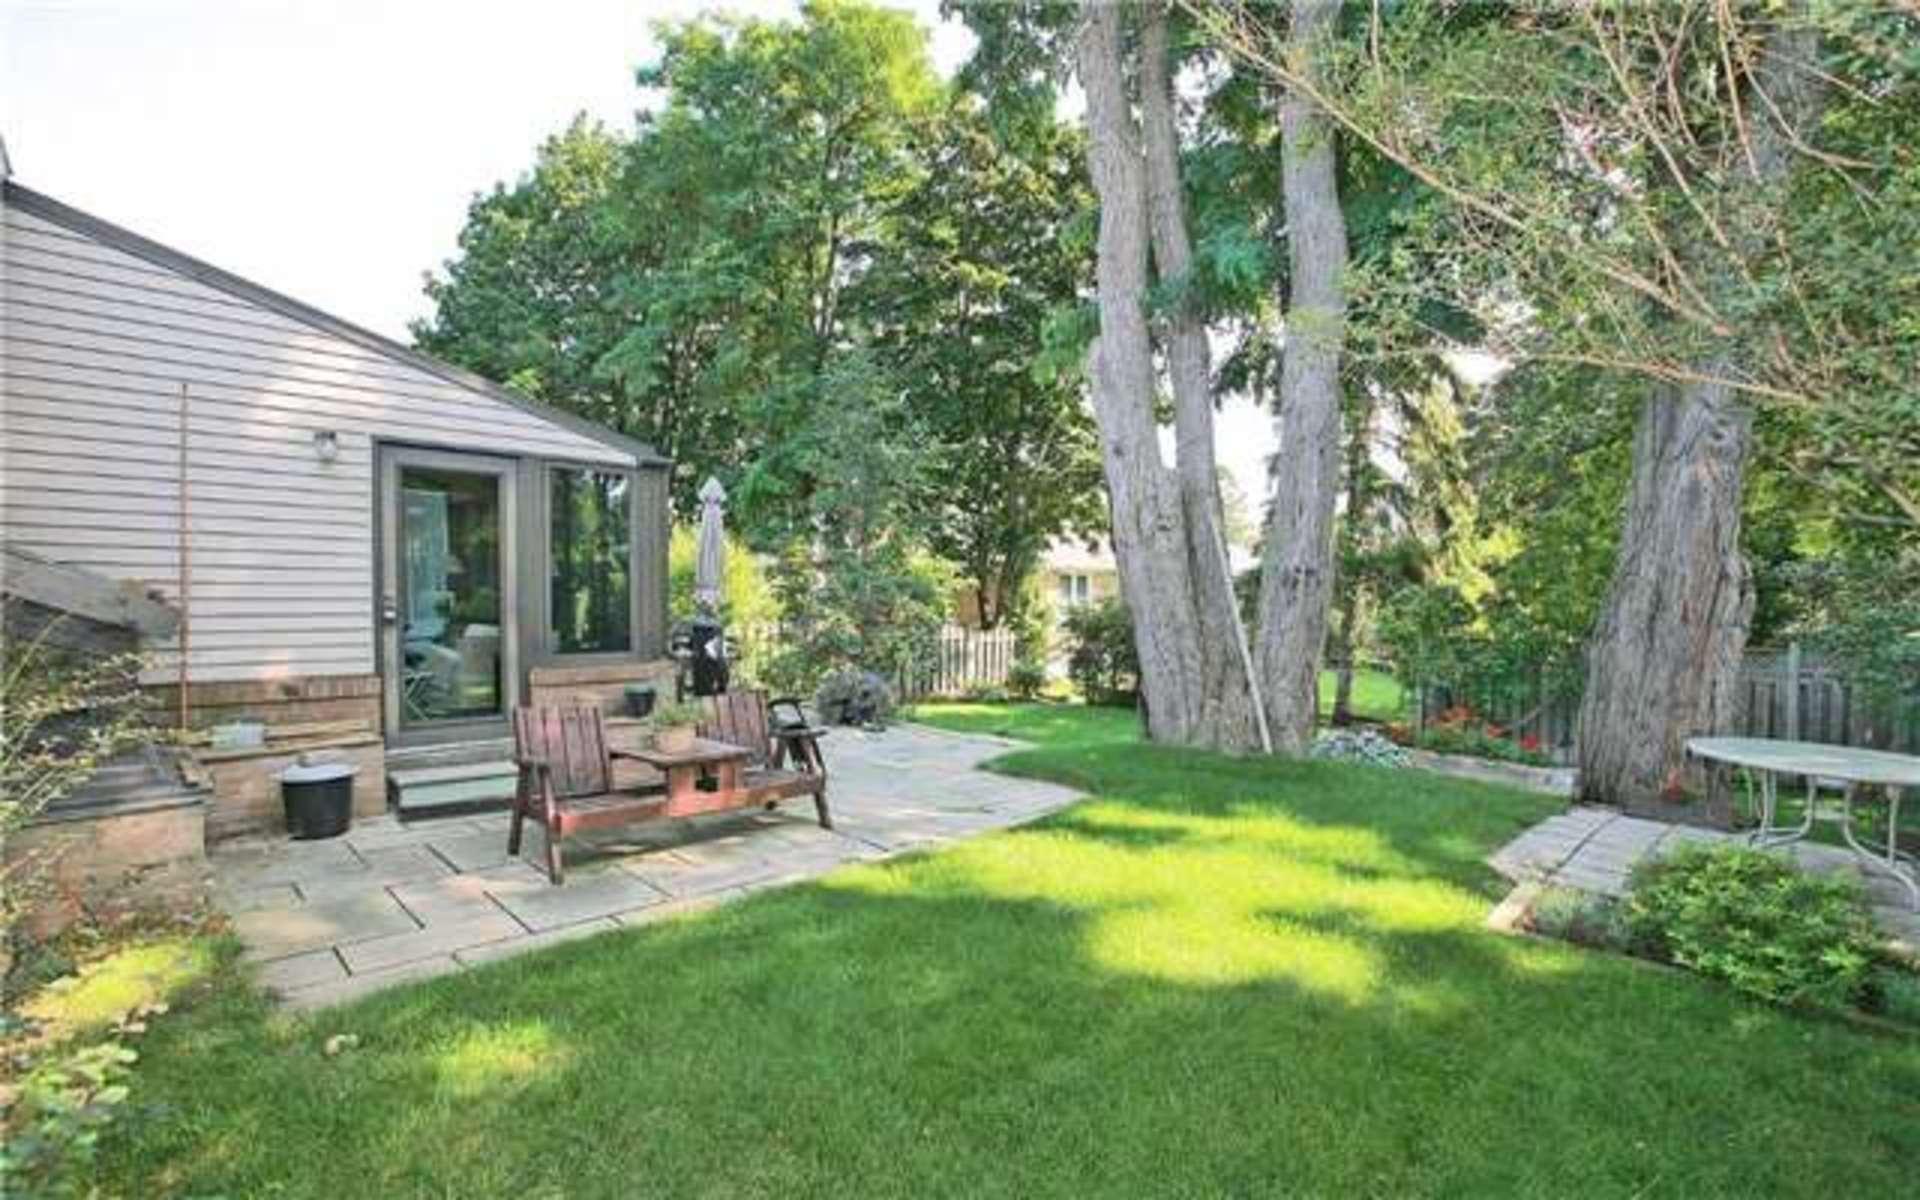 44 at SALE # 462 - 5 Sumner Heights Drive, Bayview Village, Toronto